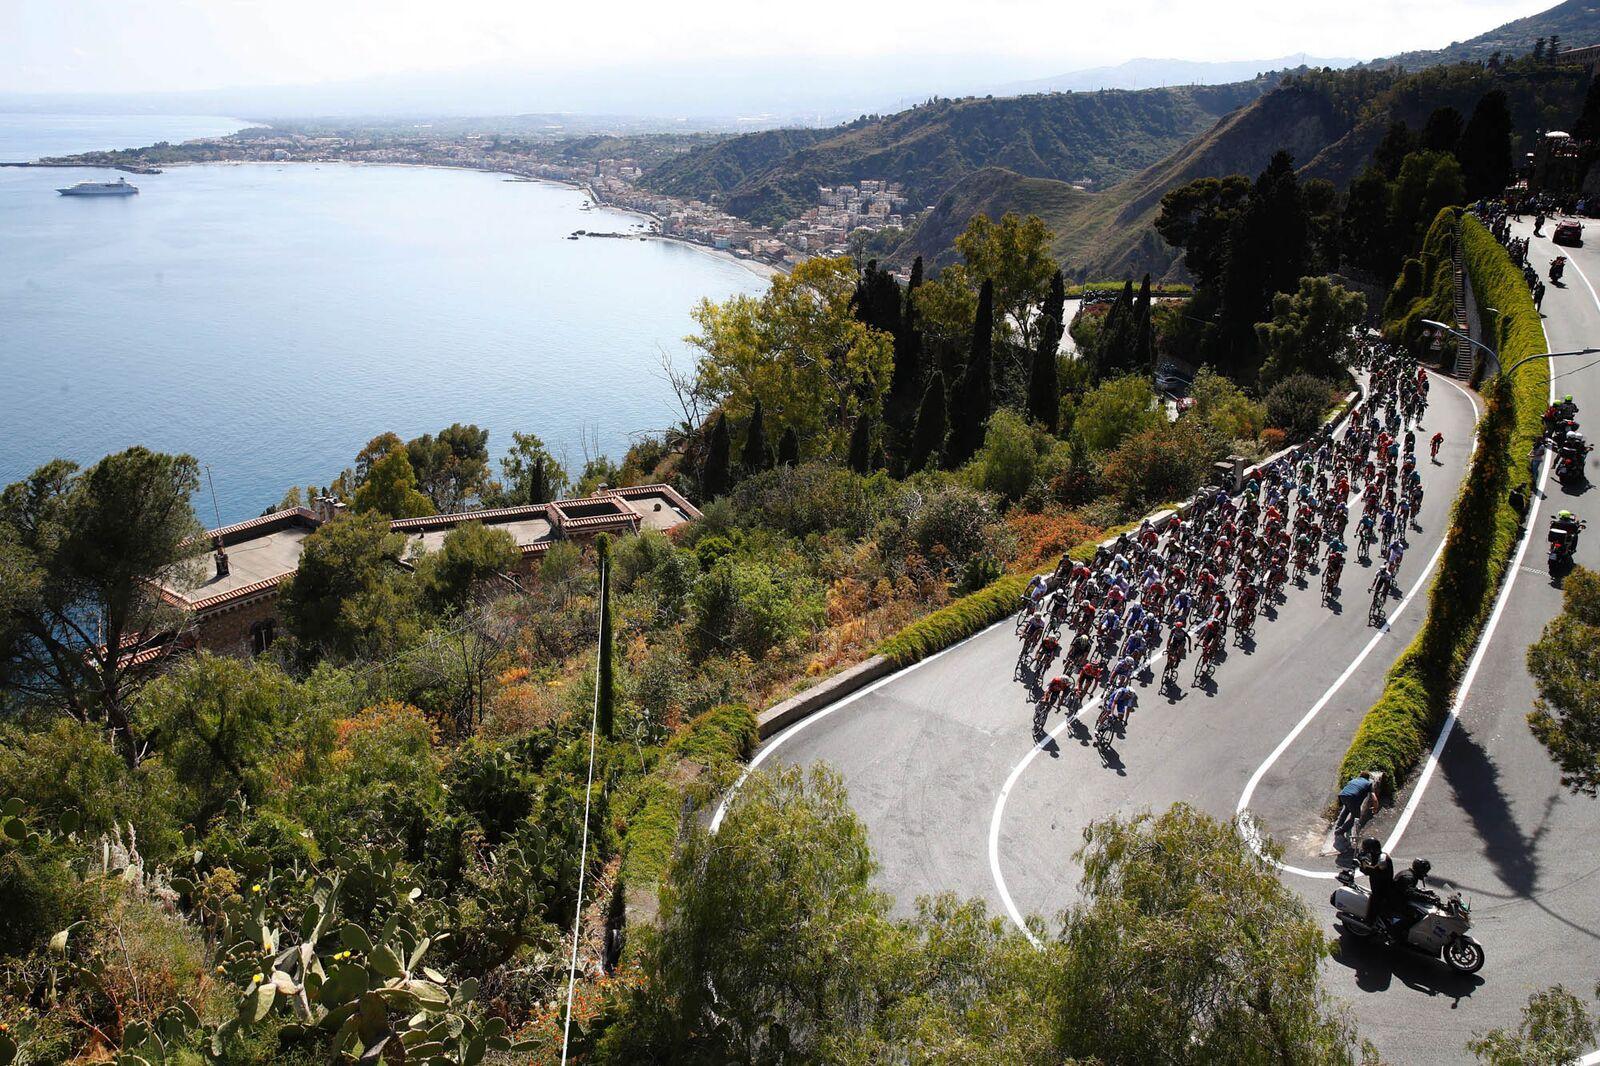 My Best Trip Ever: Richard Branson on an Italian Cycling Odyssey